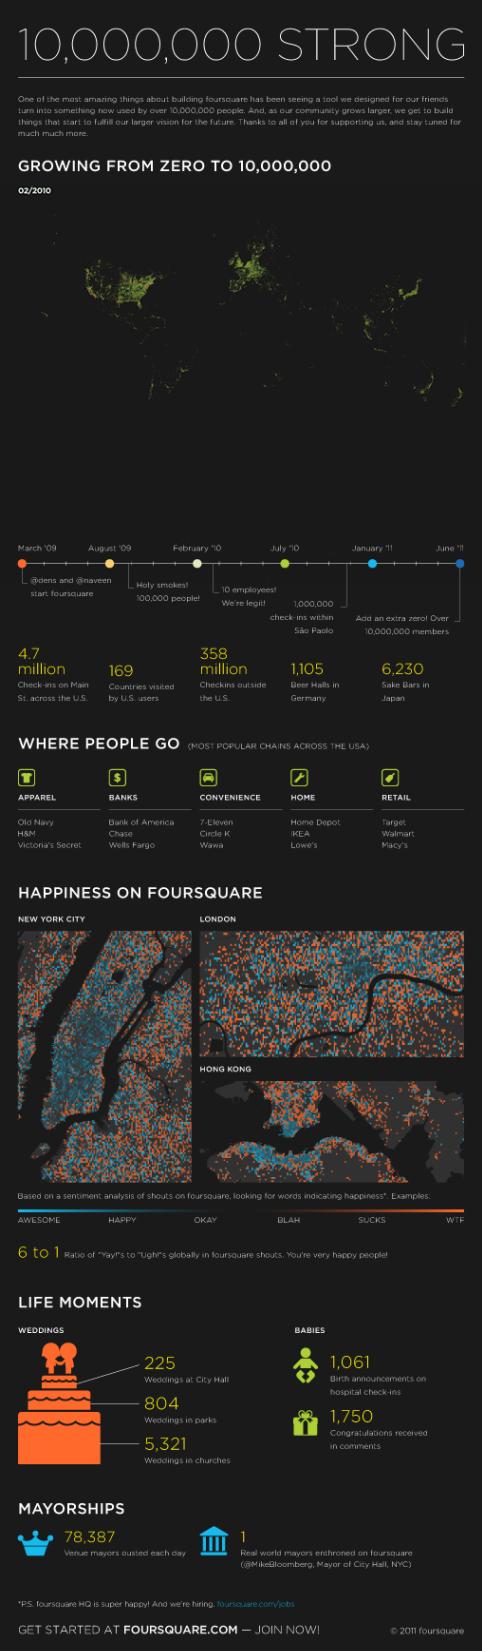 foursquare ten million